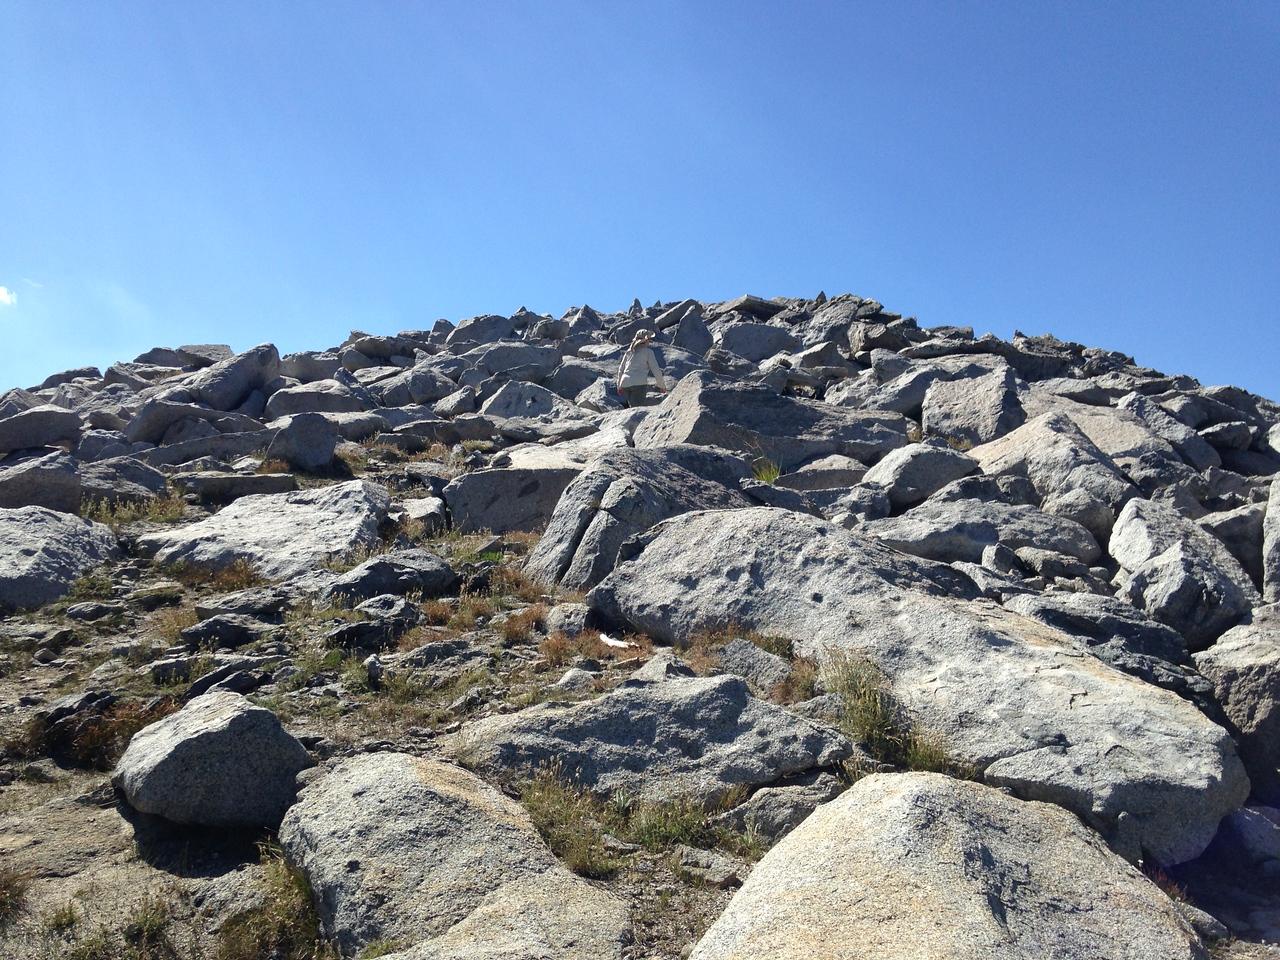 Just below the summit of Mitchell Peak, elevation 10, 365 feet.